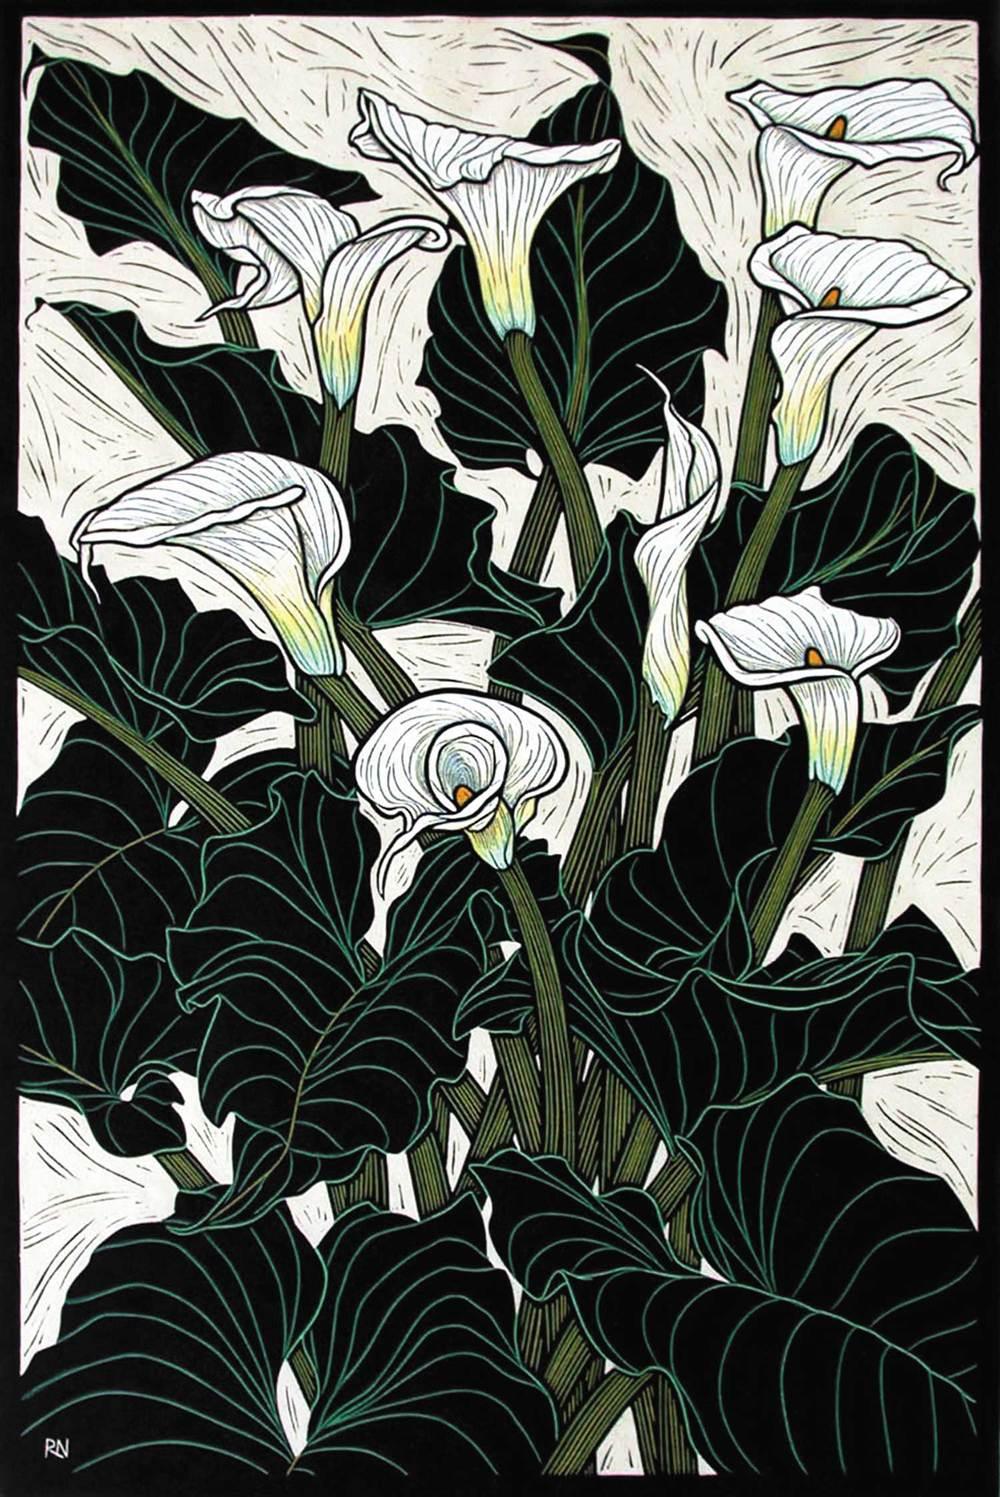 arum-lily-linocut-rachel-newling.jpg